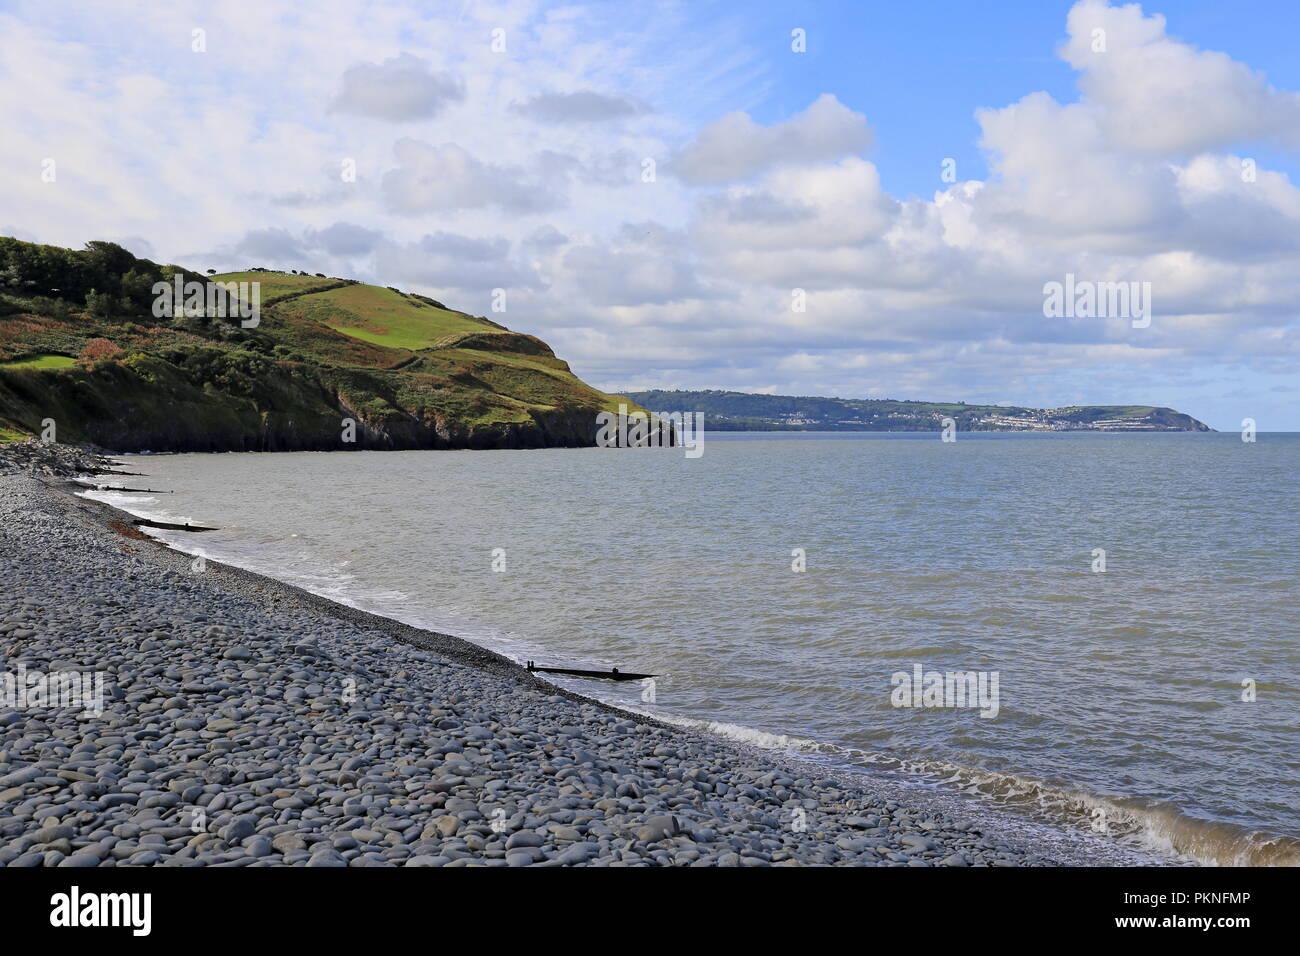 South Beach, Aberaeron, Cardigan Bay, Ceredigion, Wales, Great Britain, United Kingdom, UK, Europe - Stock Image